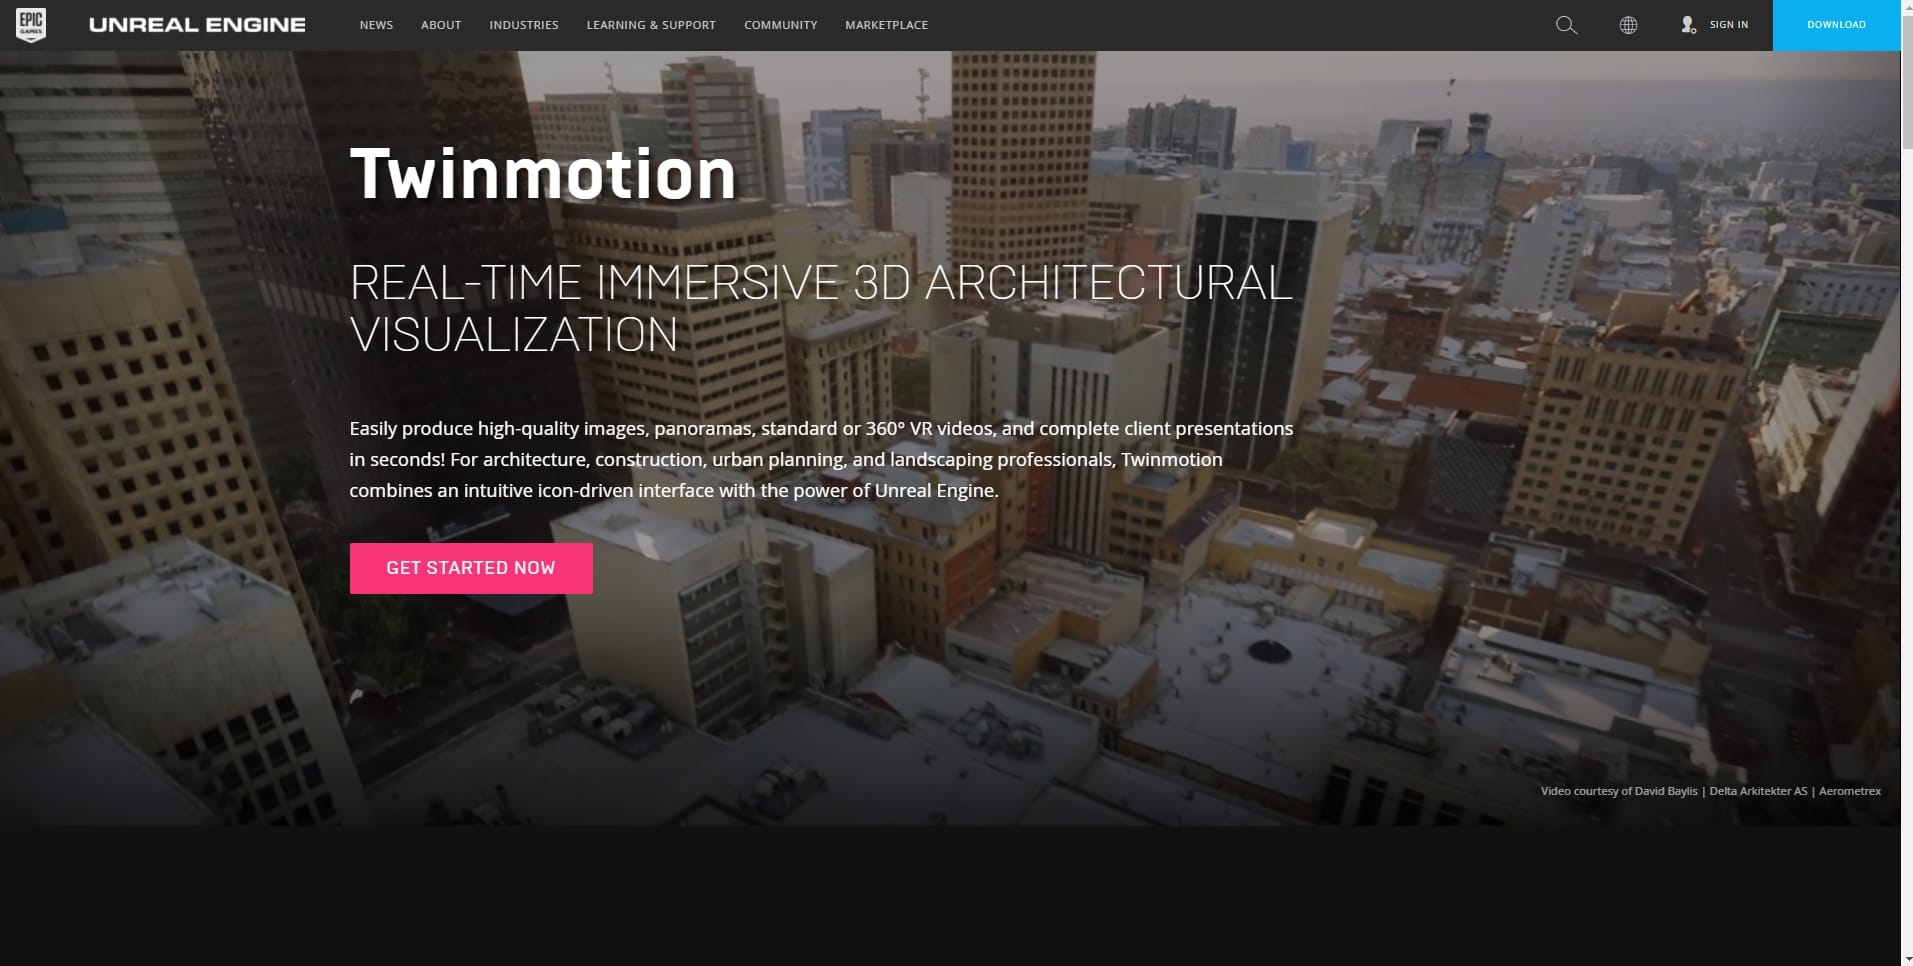 baixar twinmotion 2021 gratuitamente get started